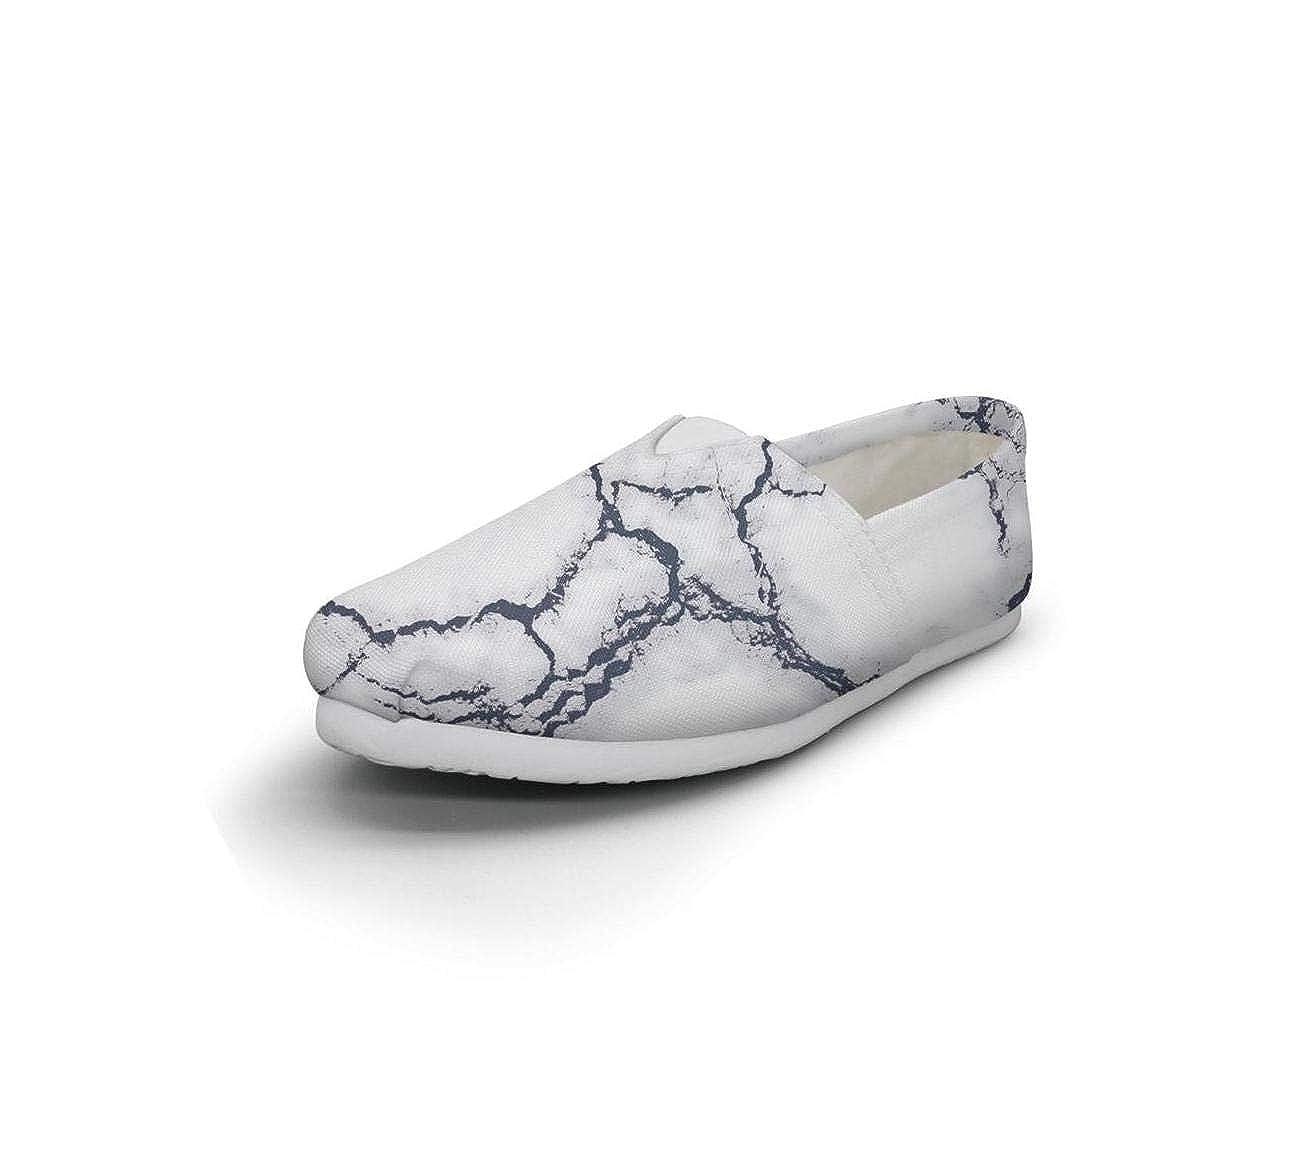 nkfbx Marble Fashion Flat Sneakers for Women Dancing